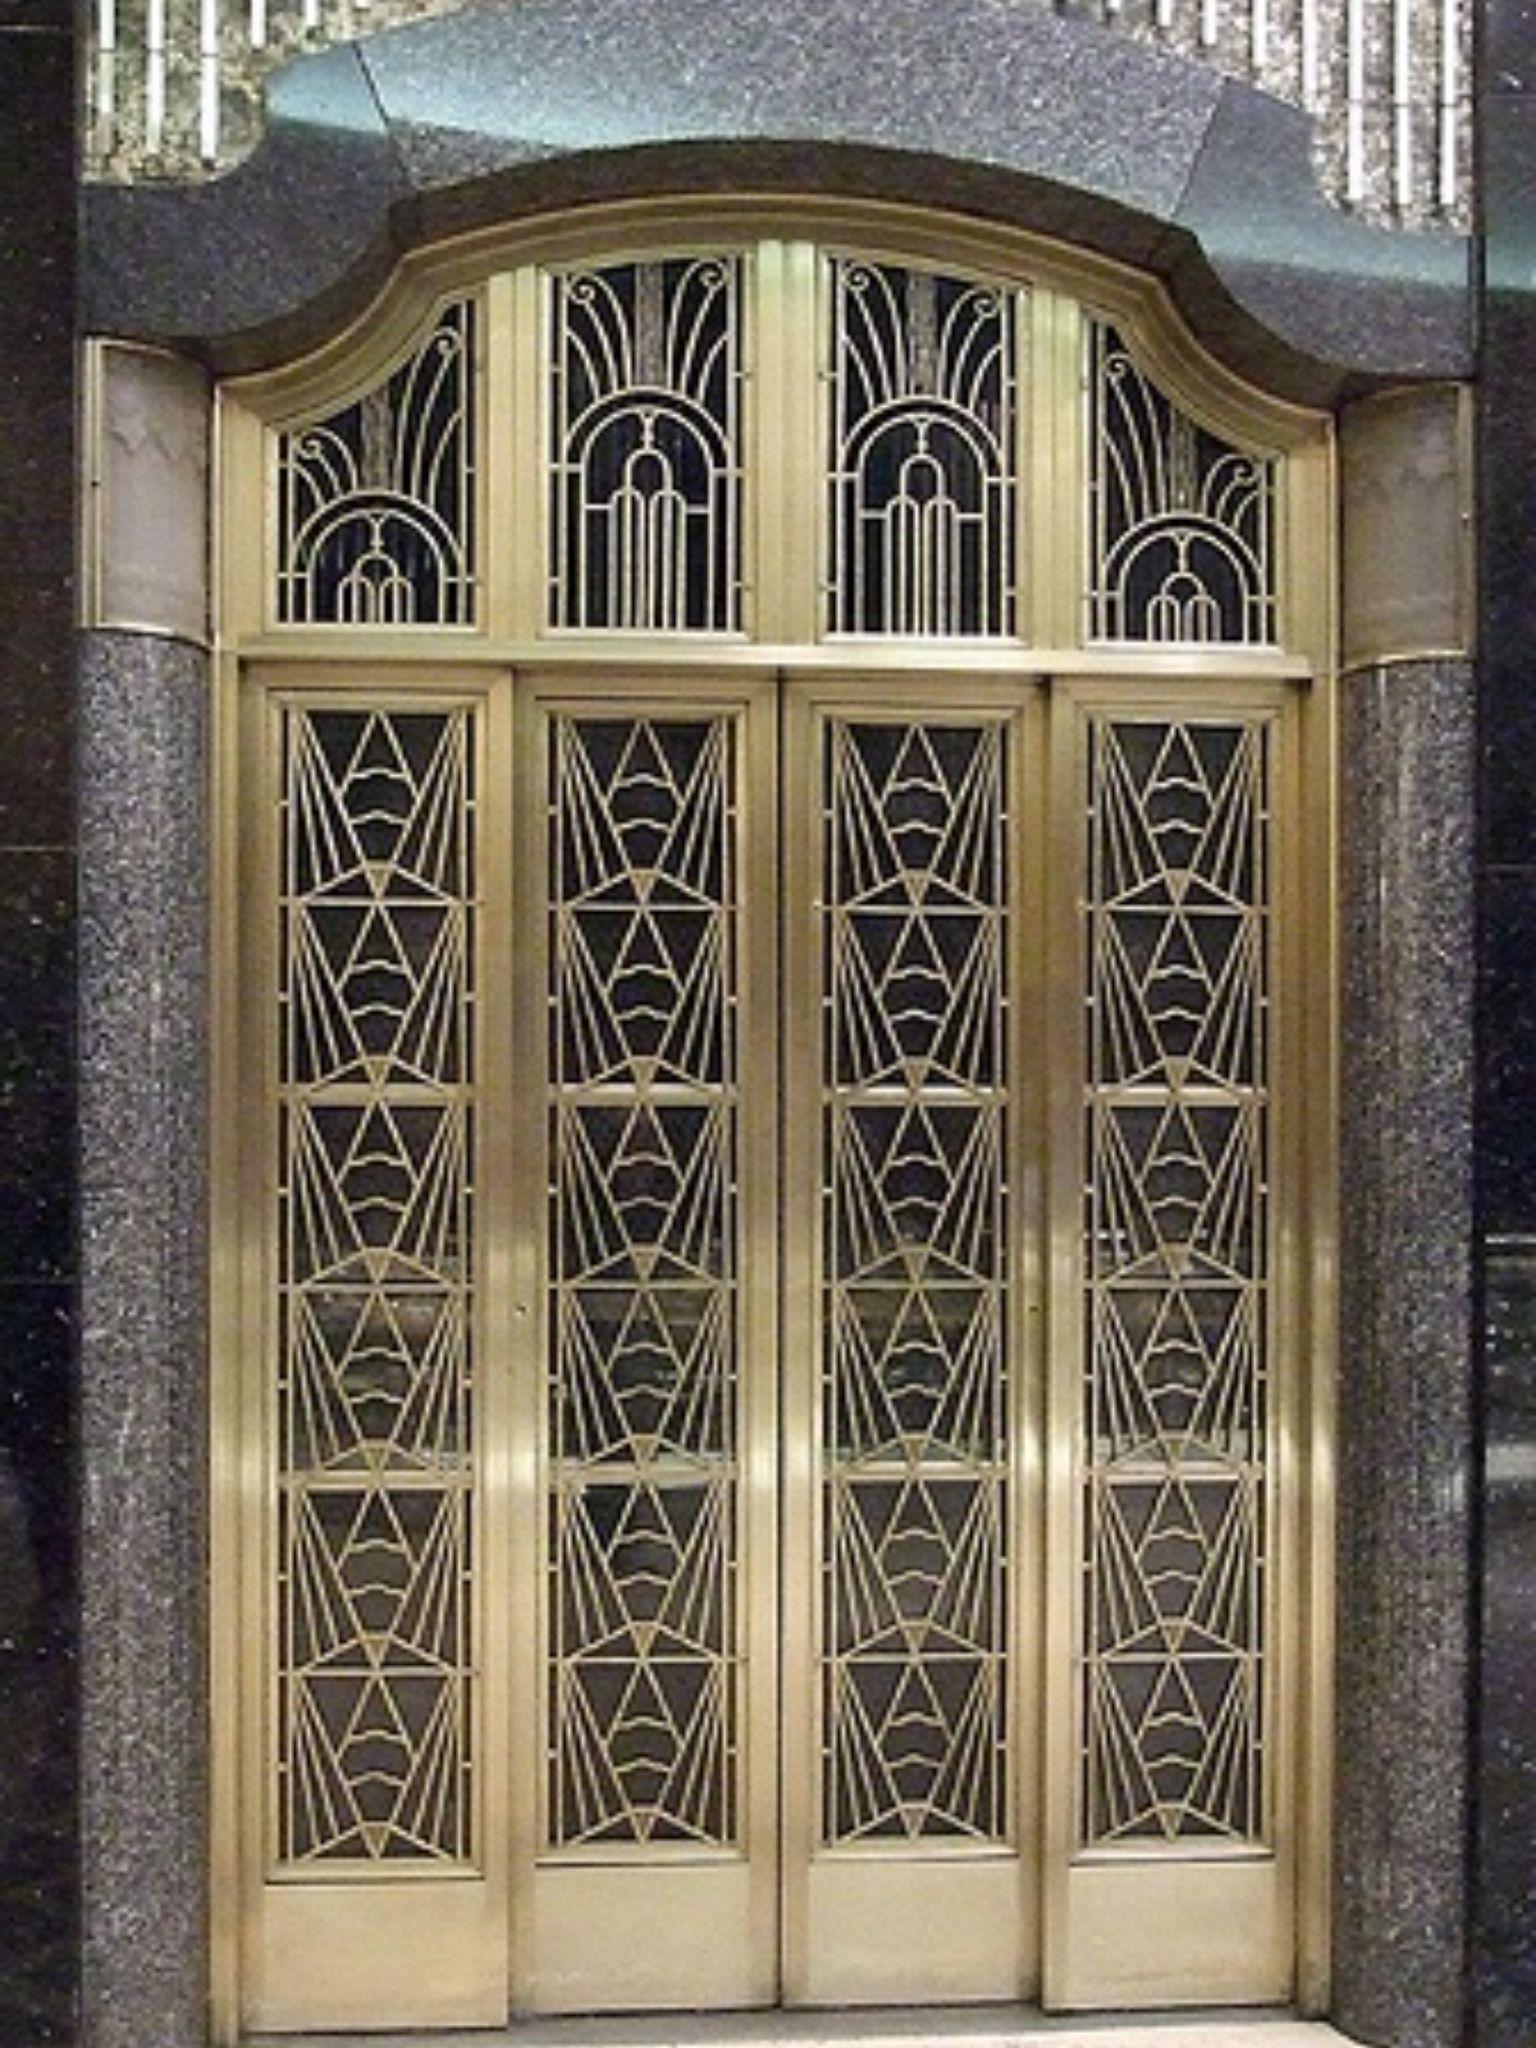 Art deco elevator door abraham and strauss department store